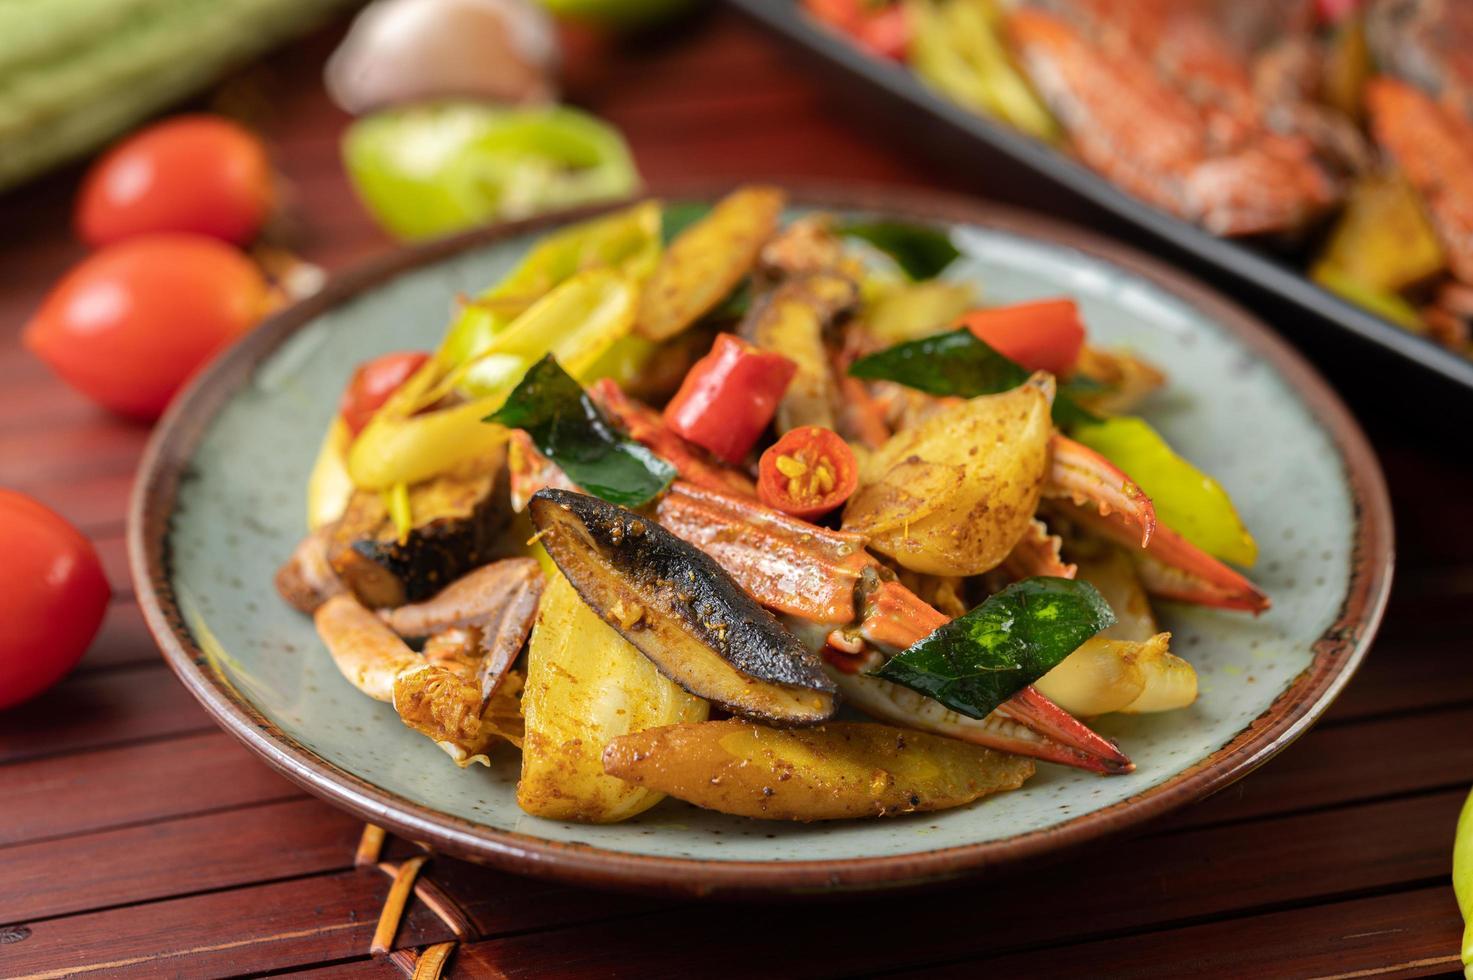 Stir-fried crab dish photo